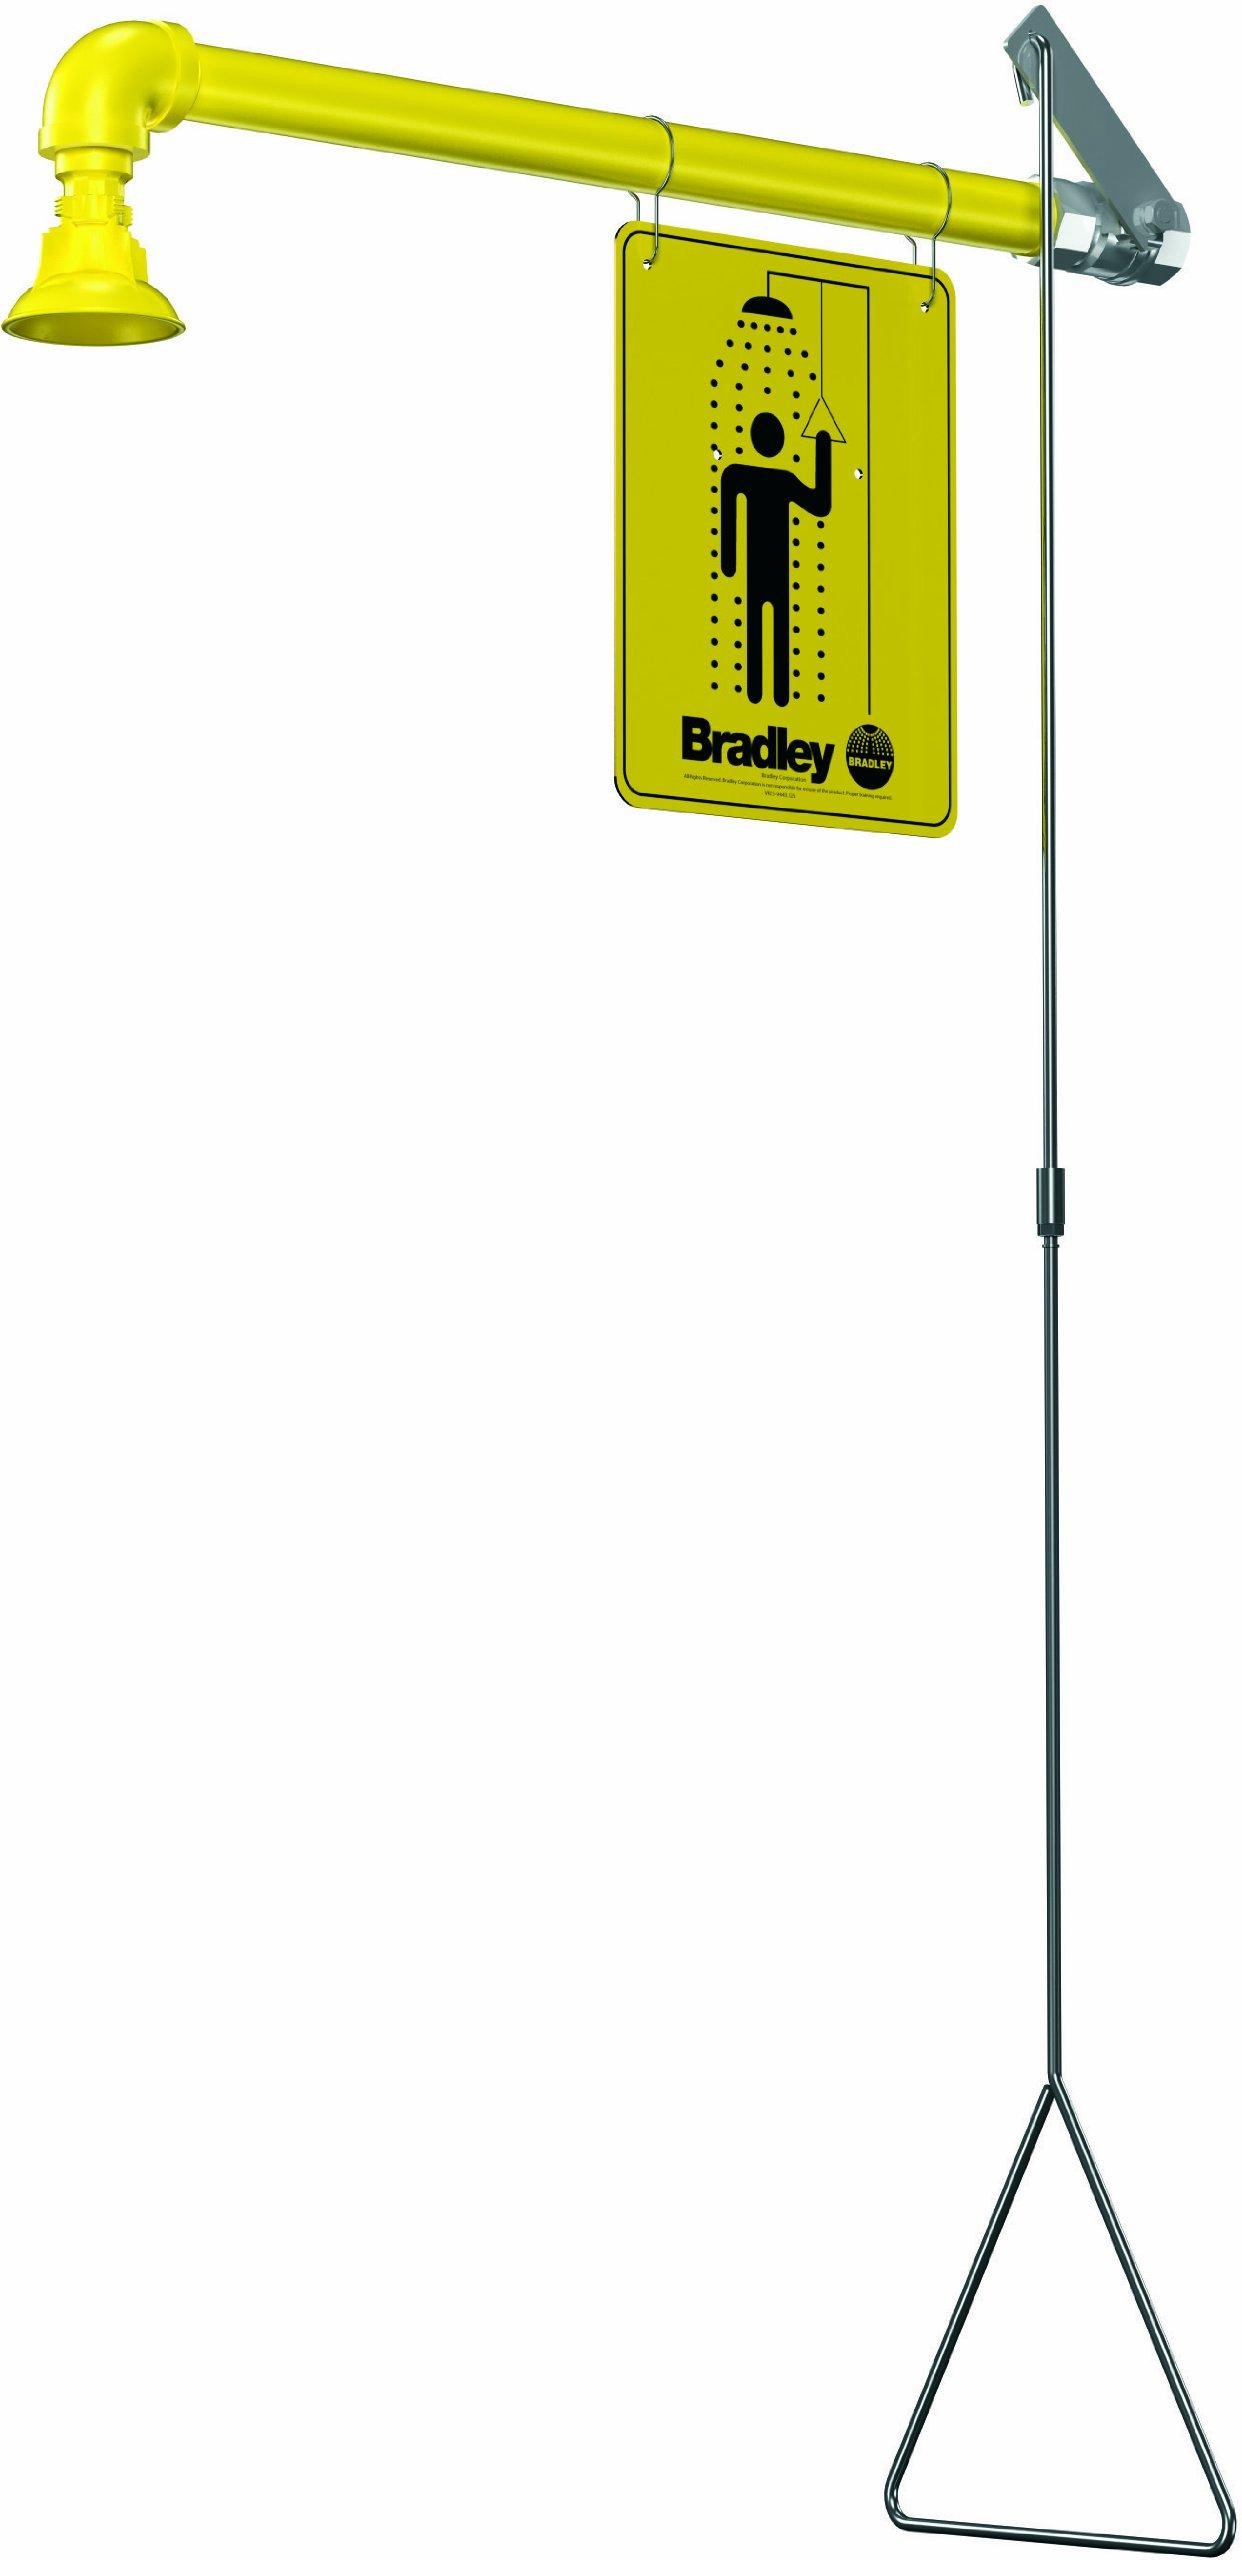 Bradley S19-120BF Galvanized Steel 1 Spray Head Barrier Free Safety Shower with Plastic Showerhead, Wall Mount, 20 GPM Water Flow, 9'' Width x 45'' Height x 24'' Depth